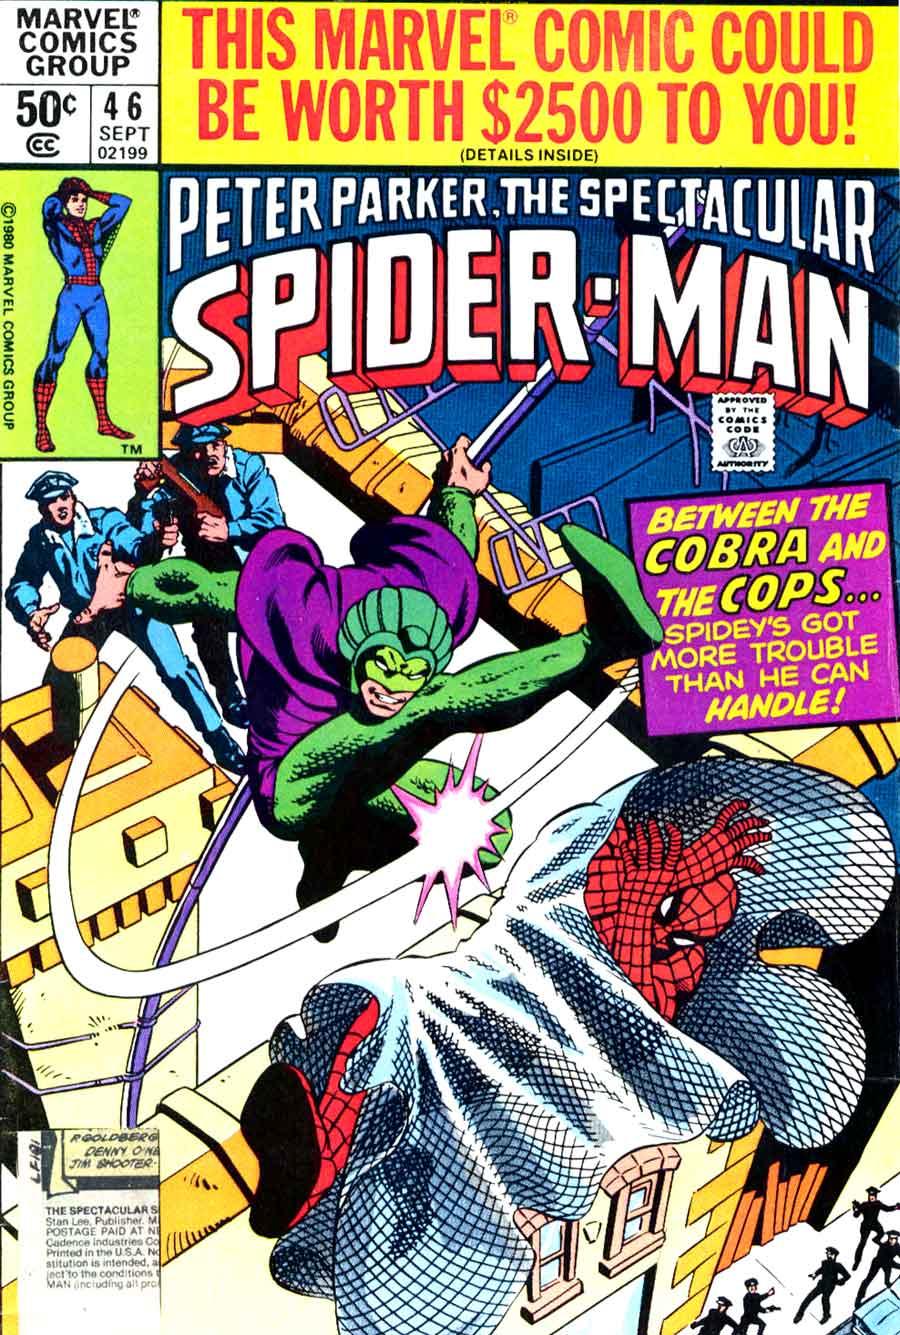 Spectacular Spider-man v2 #46 marvel 1980s comic book cover art by Frank Miller